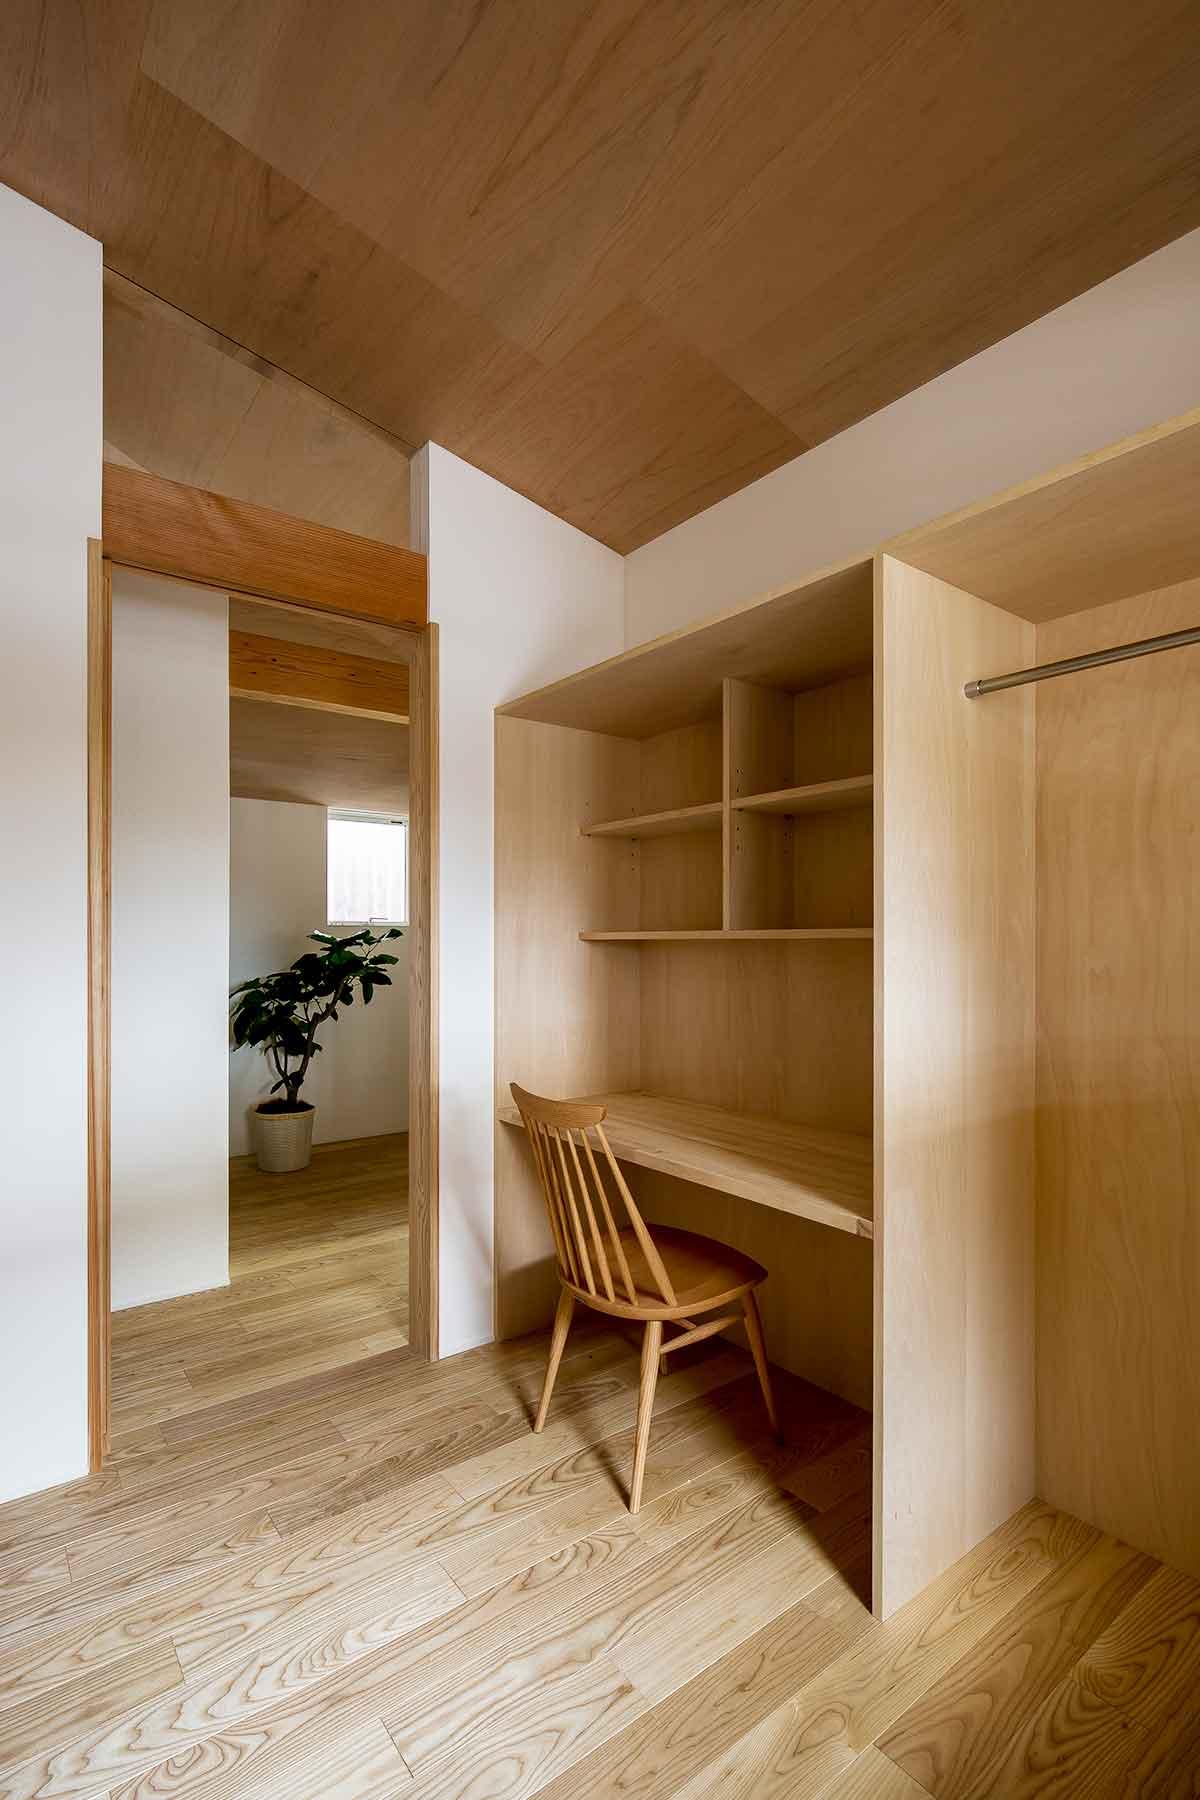 Architecture-by-Hearth-Architects,-Japan.--Photography-by-Yuta-Yamada-01.jpg